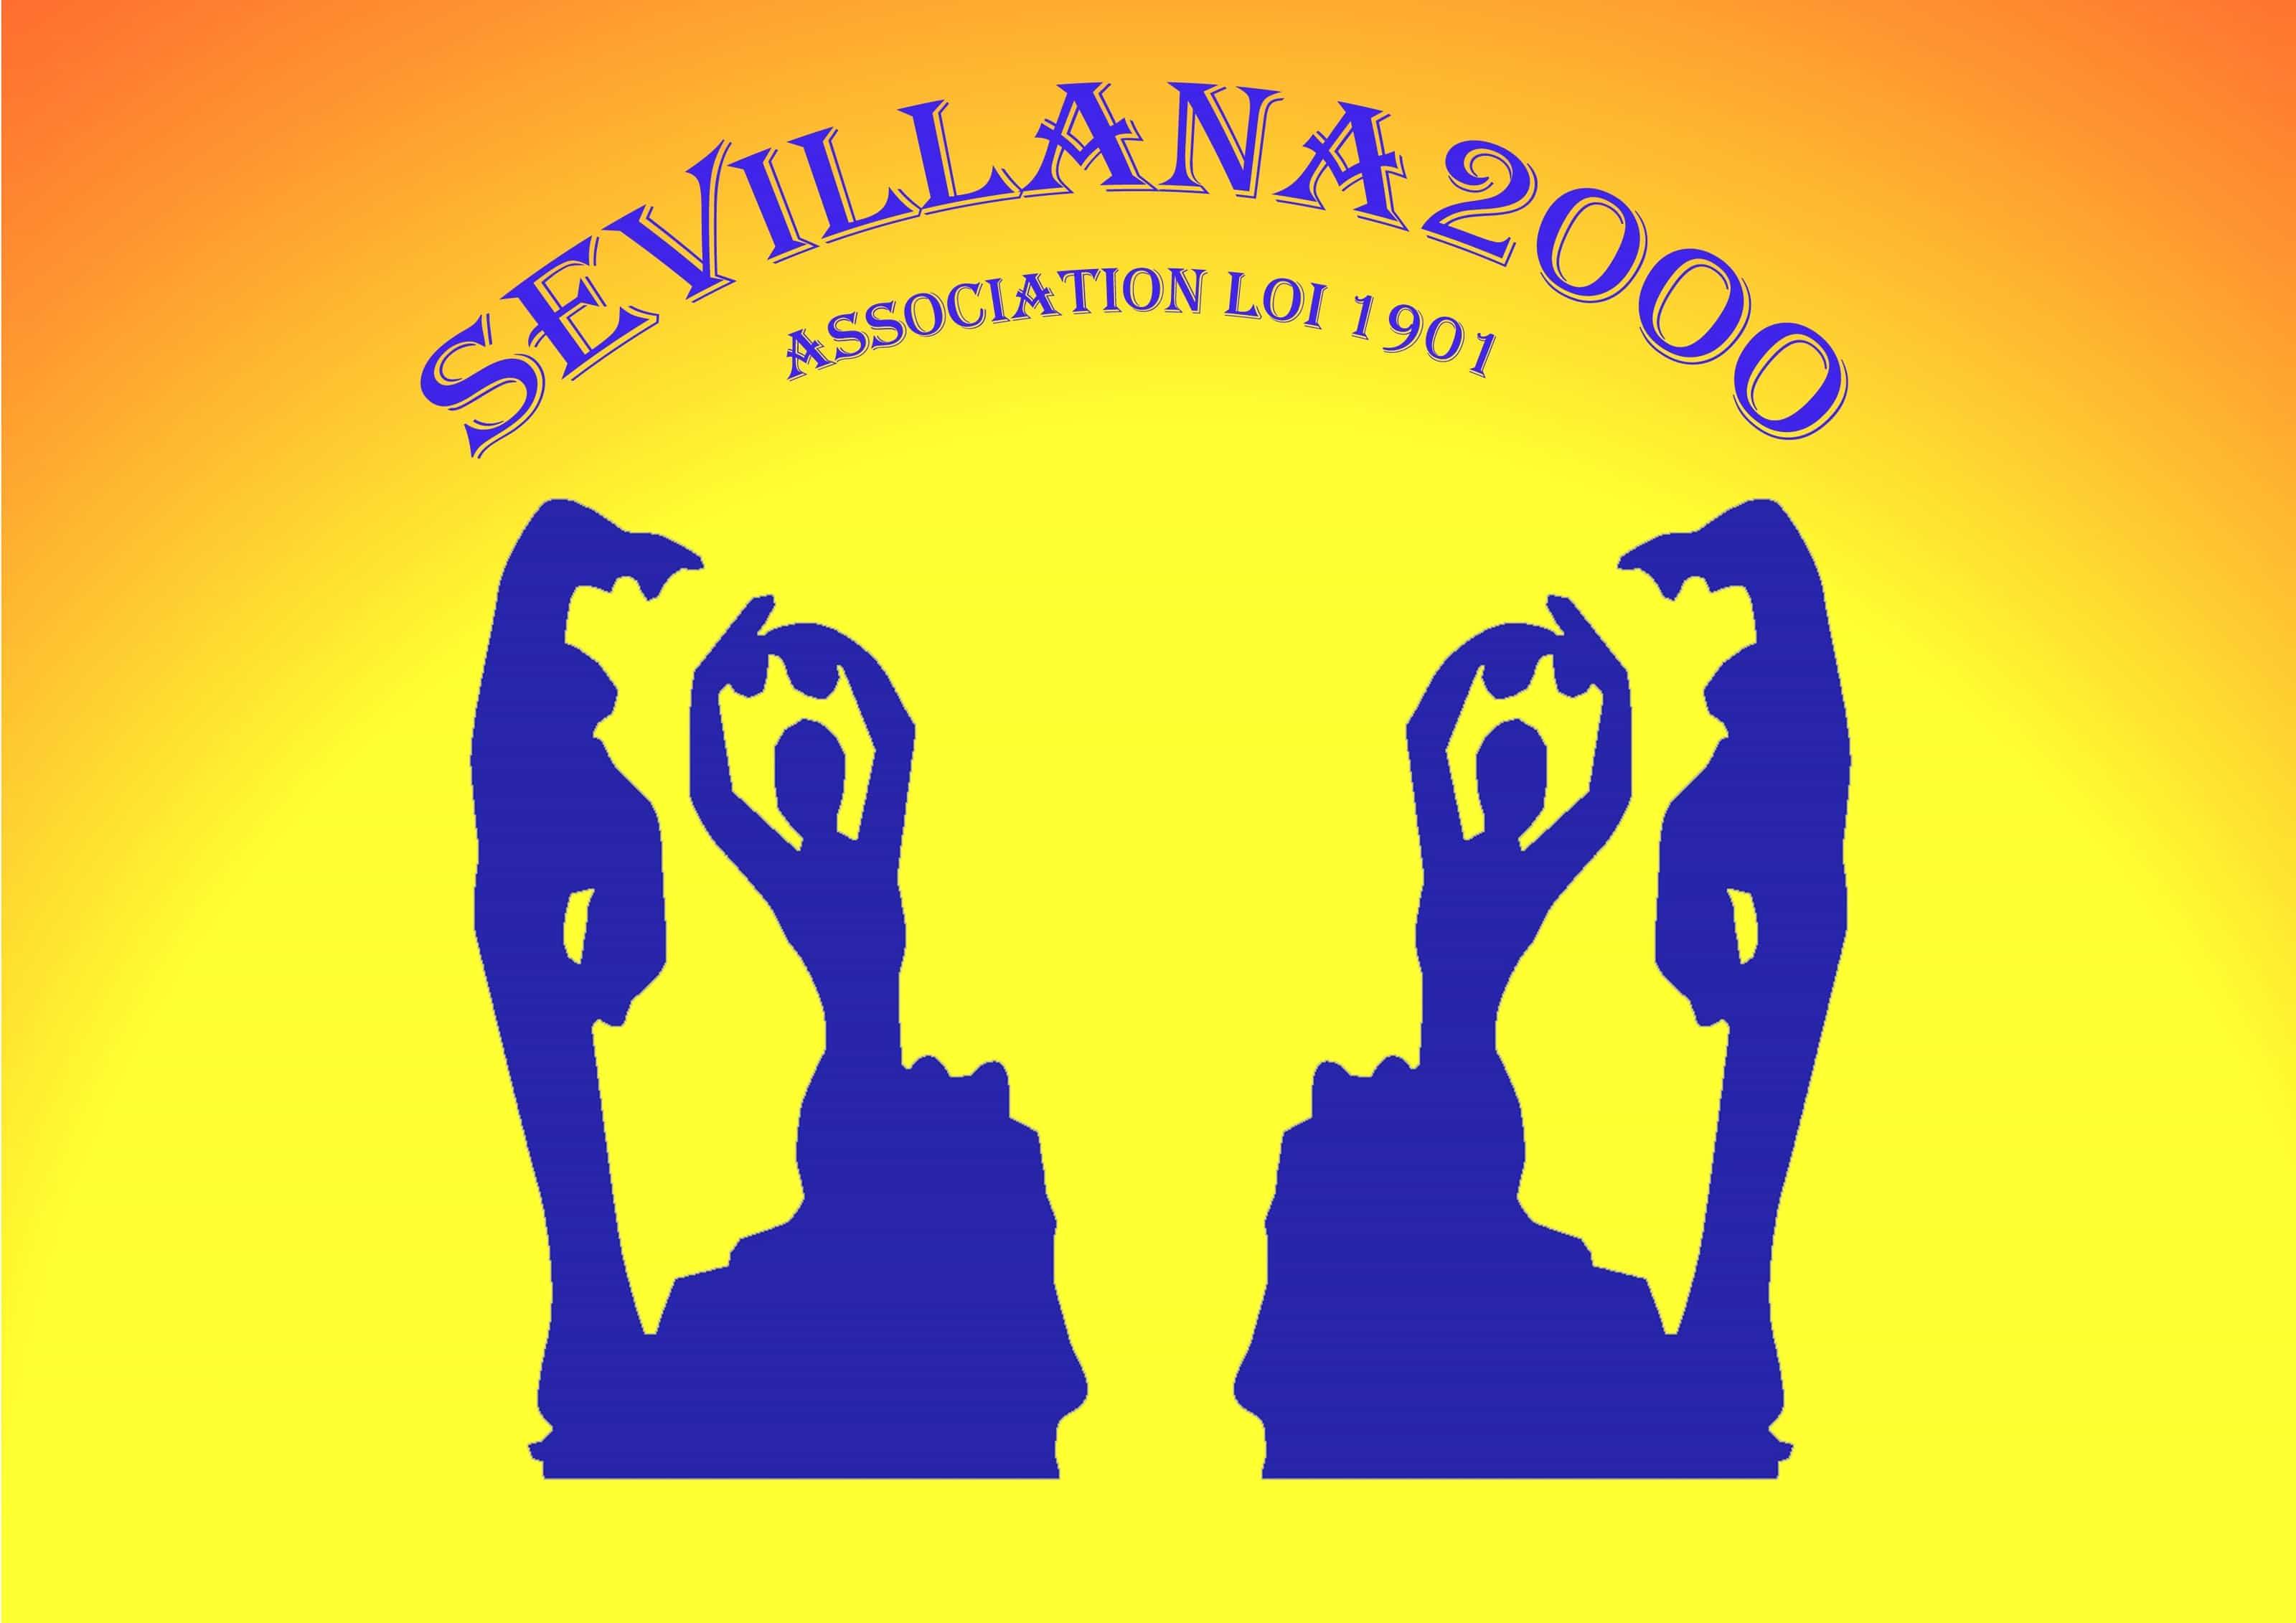 Sevillana2000